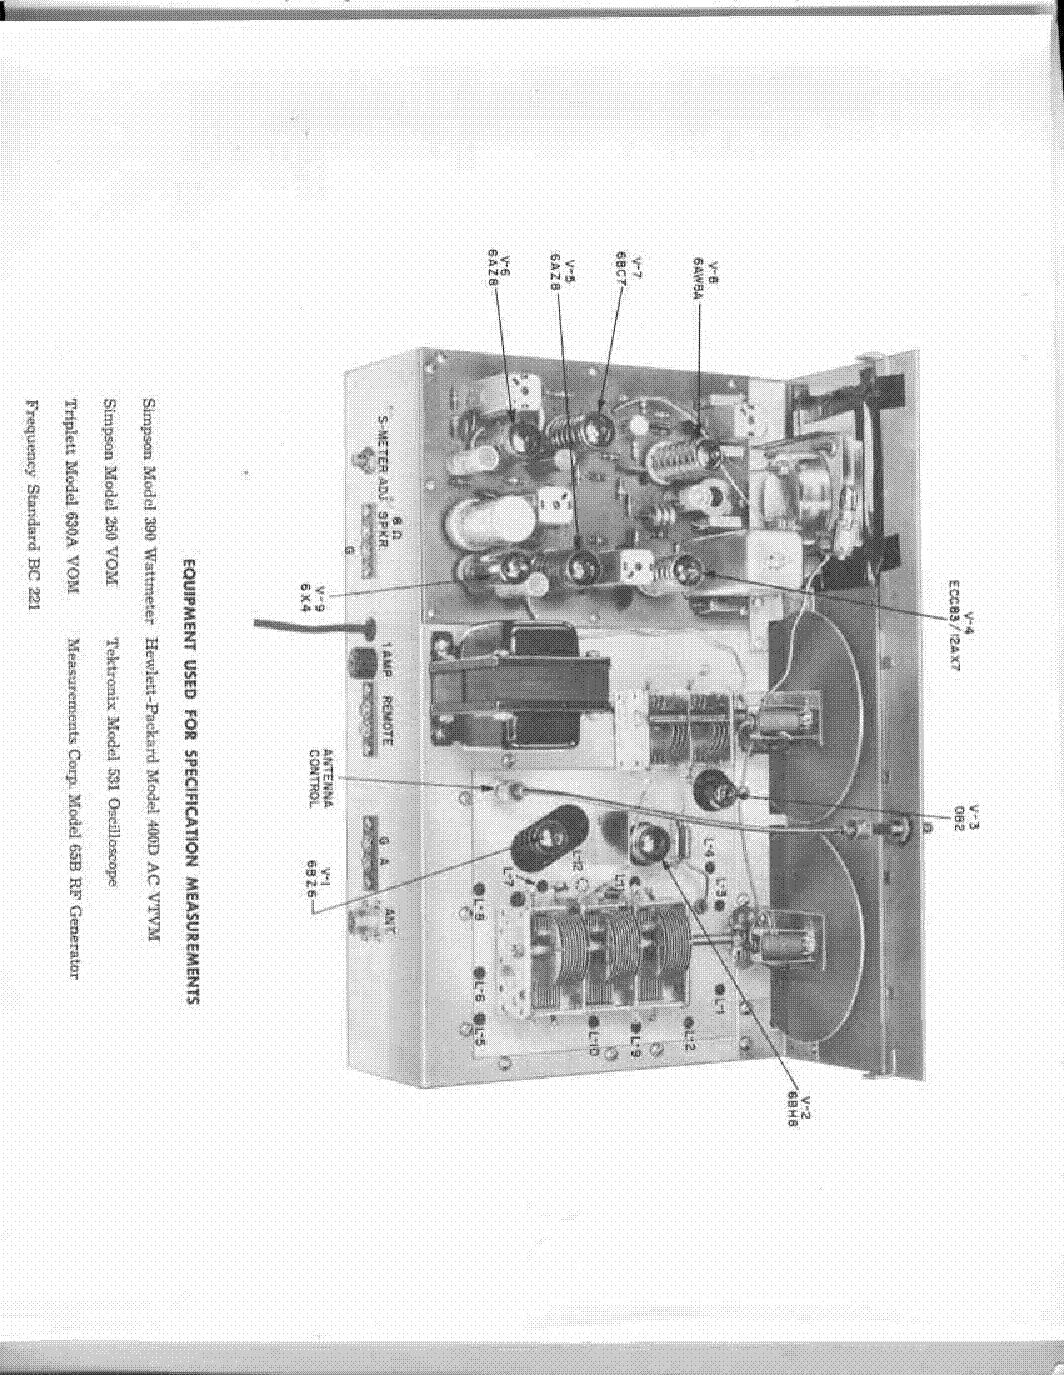 radio waves diagram radio free engine image for user manual infrared transmission diagram file radio waves svg wikimedia commons